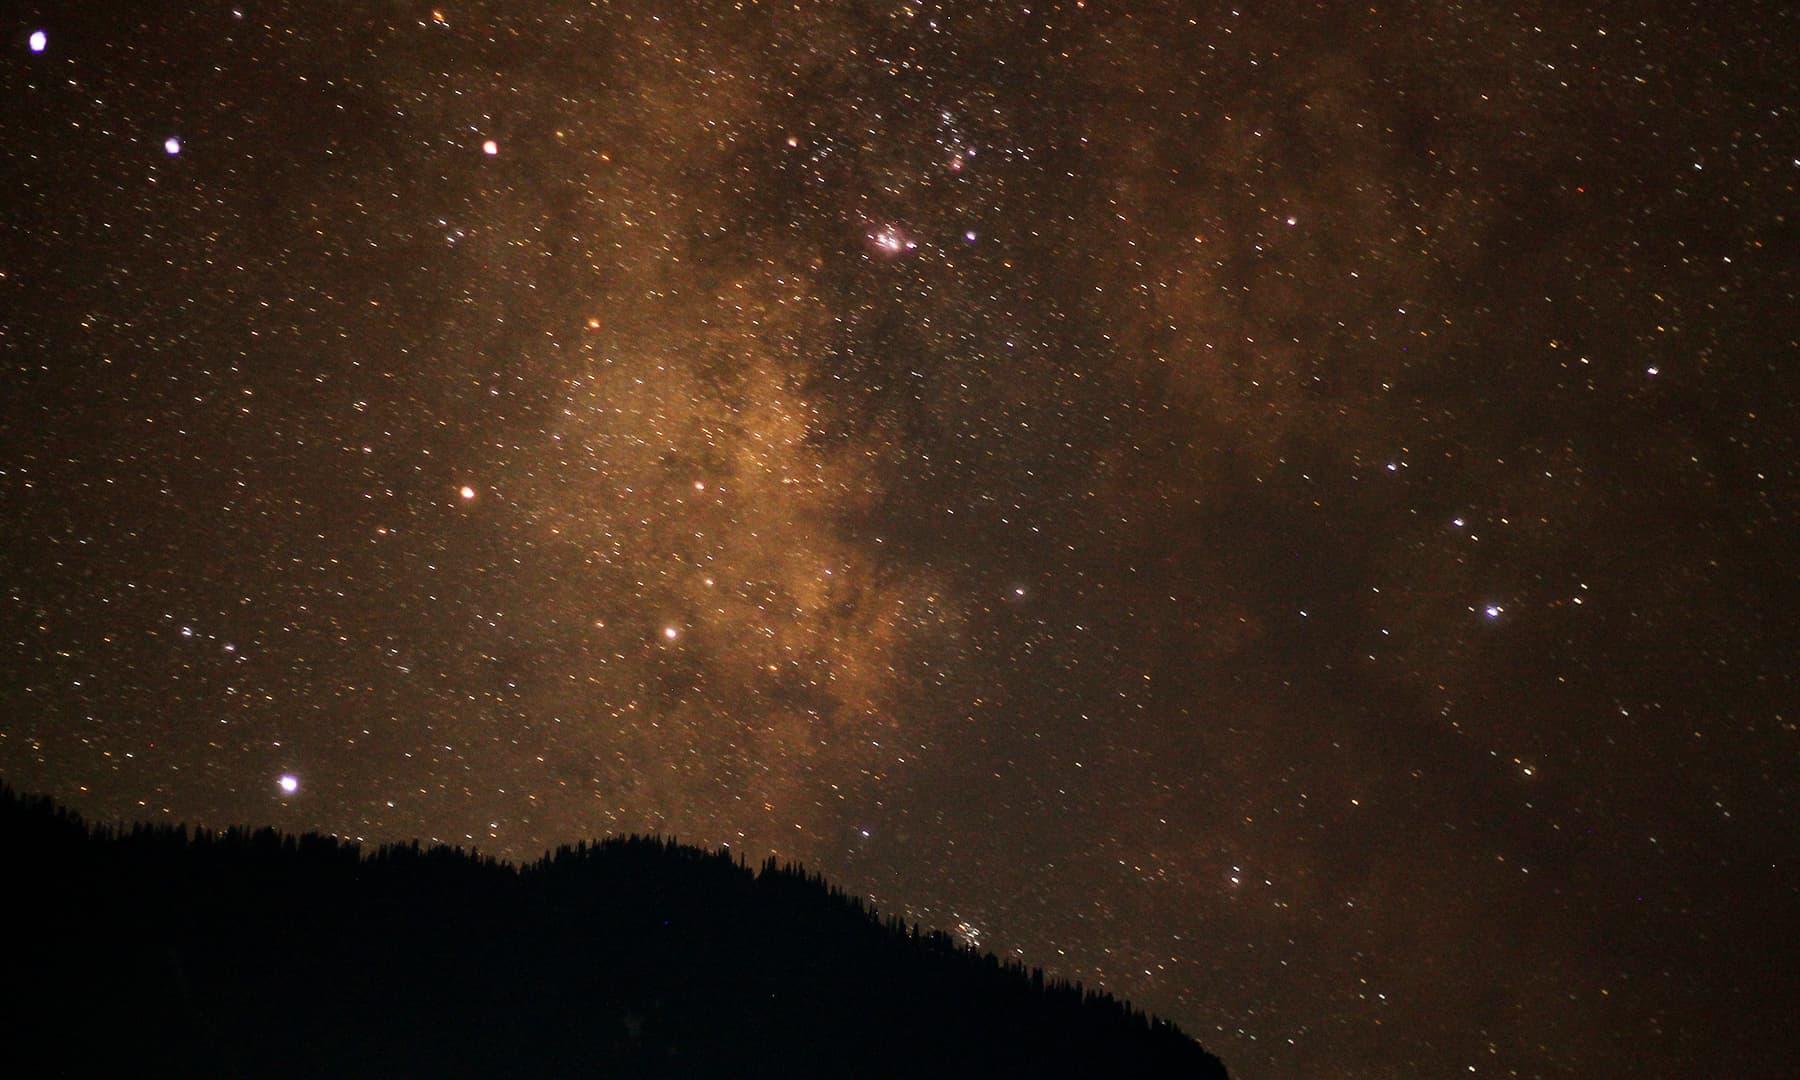 Starry skies in Shardha. —Asif Mahmood